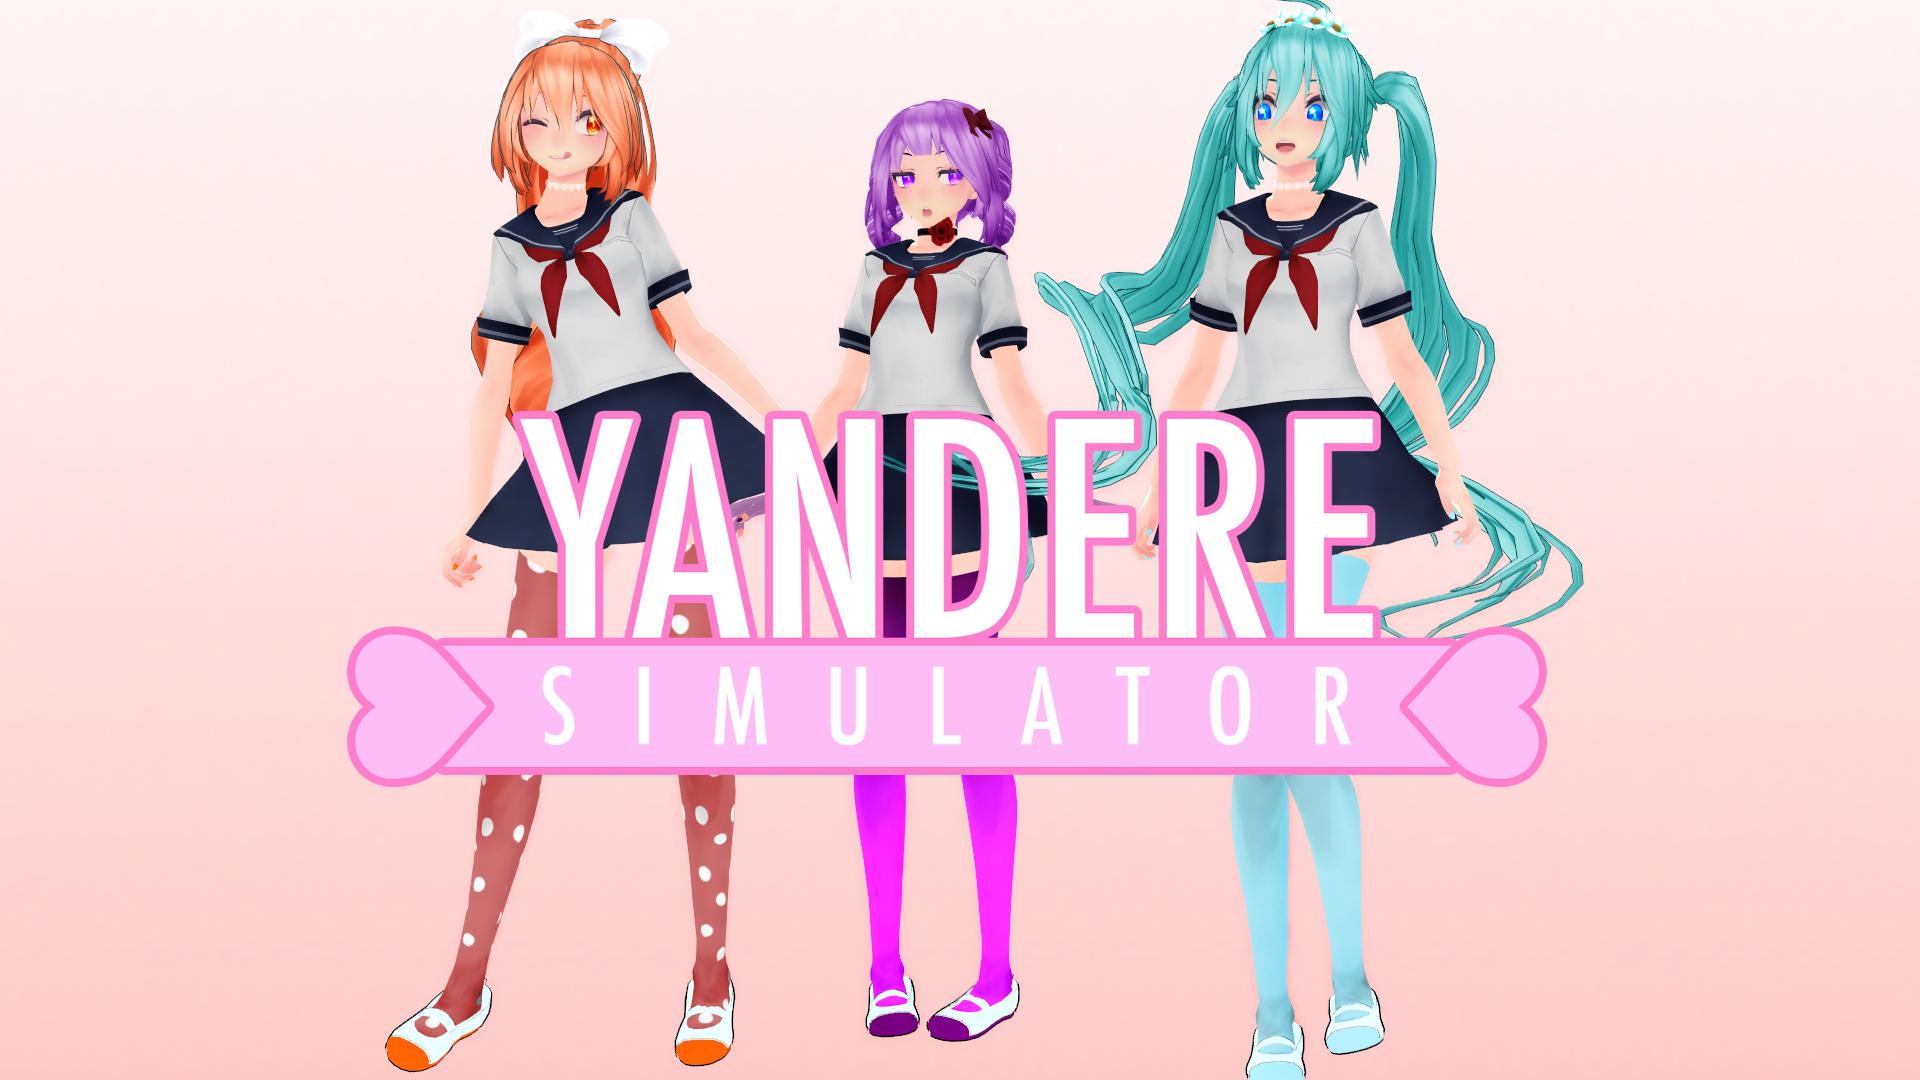 MMD Pack YandereSimulator DL!!! By SakiMiyuMMD On DeviantArt